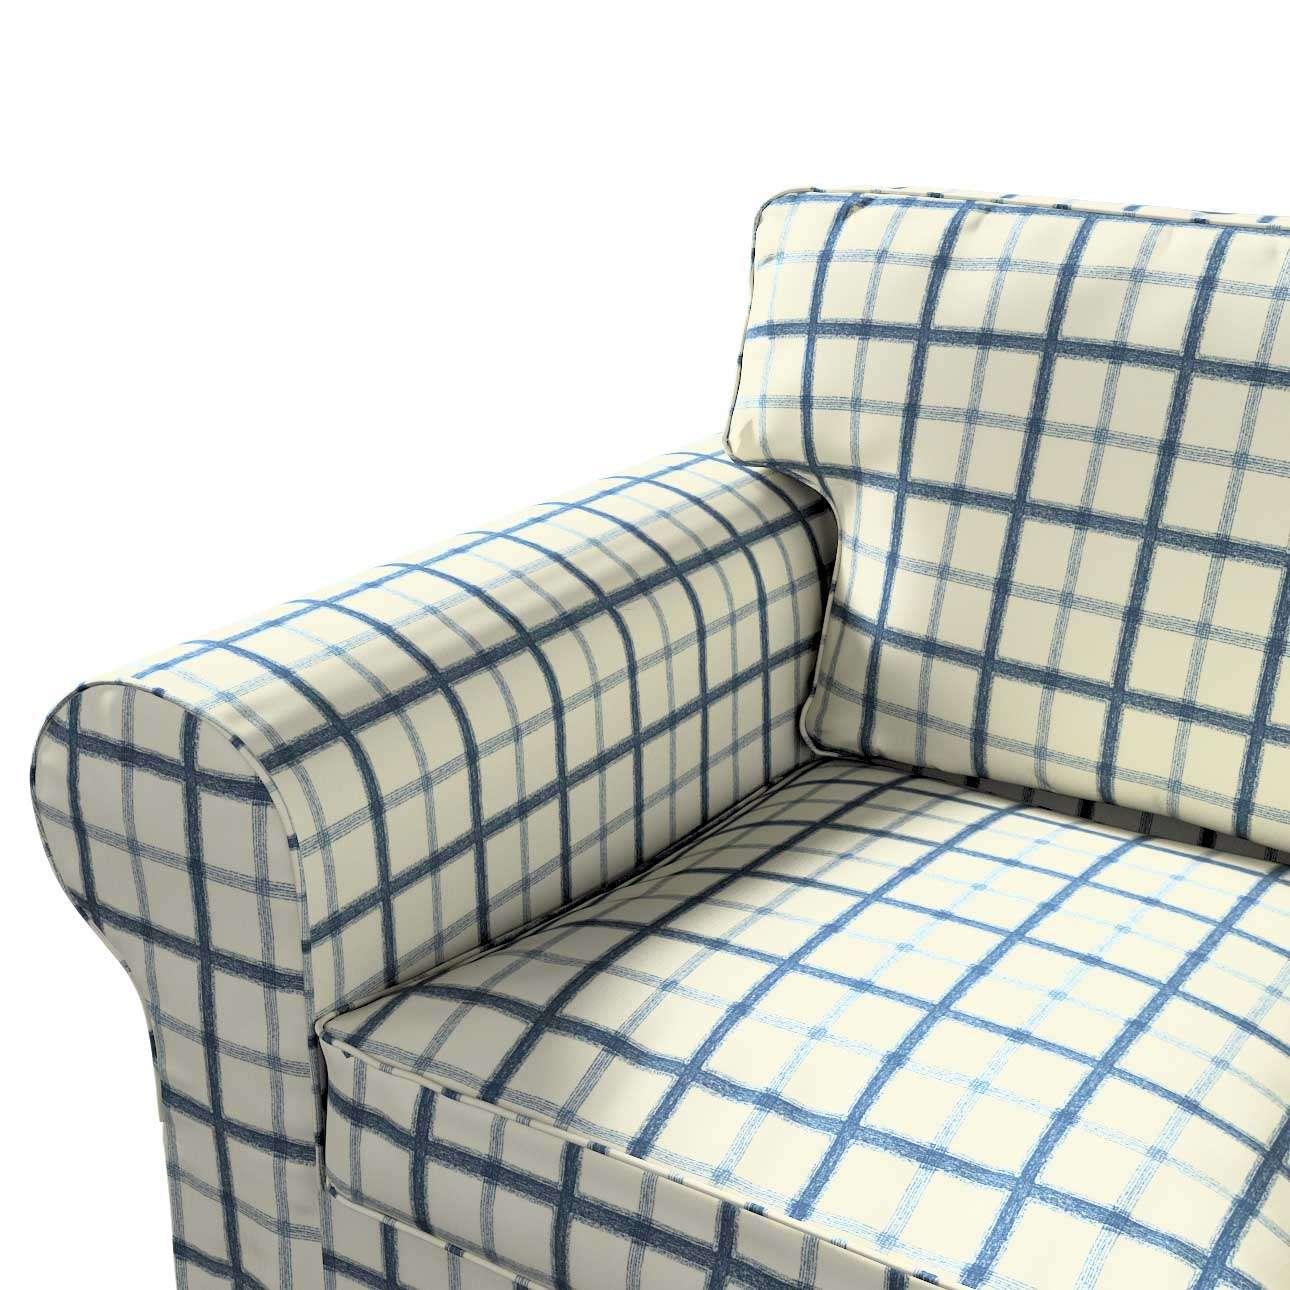 Ektorp betræk 2 sæder sovesofa<br/>fra 2012<br/>Bredde ca 200cm fra kollektionen Avinon, Stof: 131-66